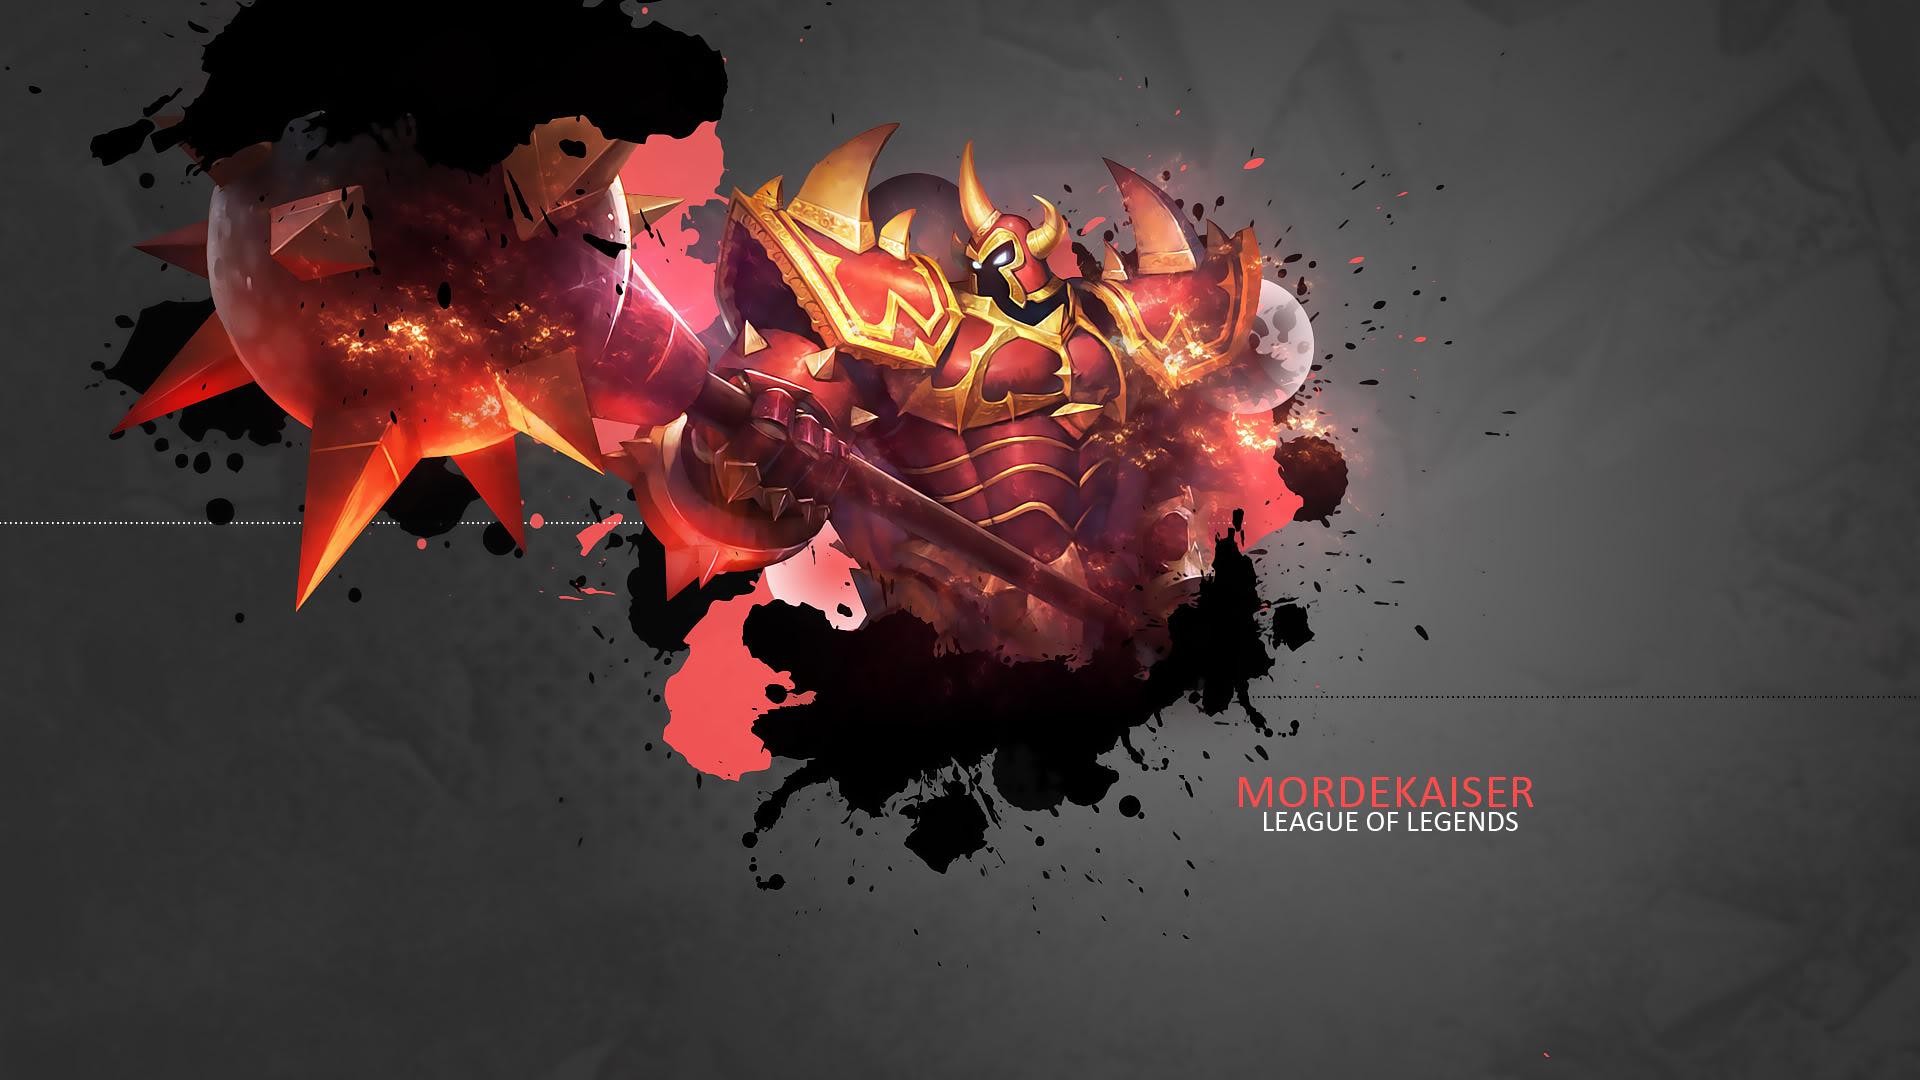 League of Legends wallpaper 149